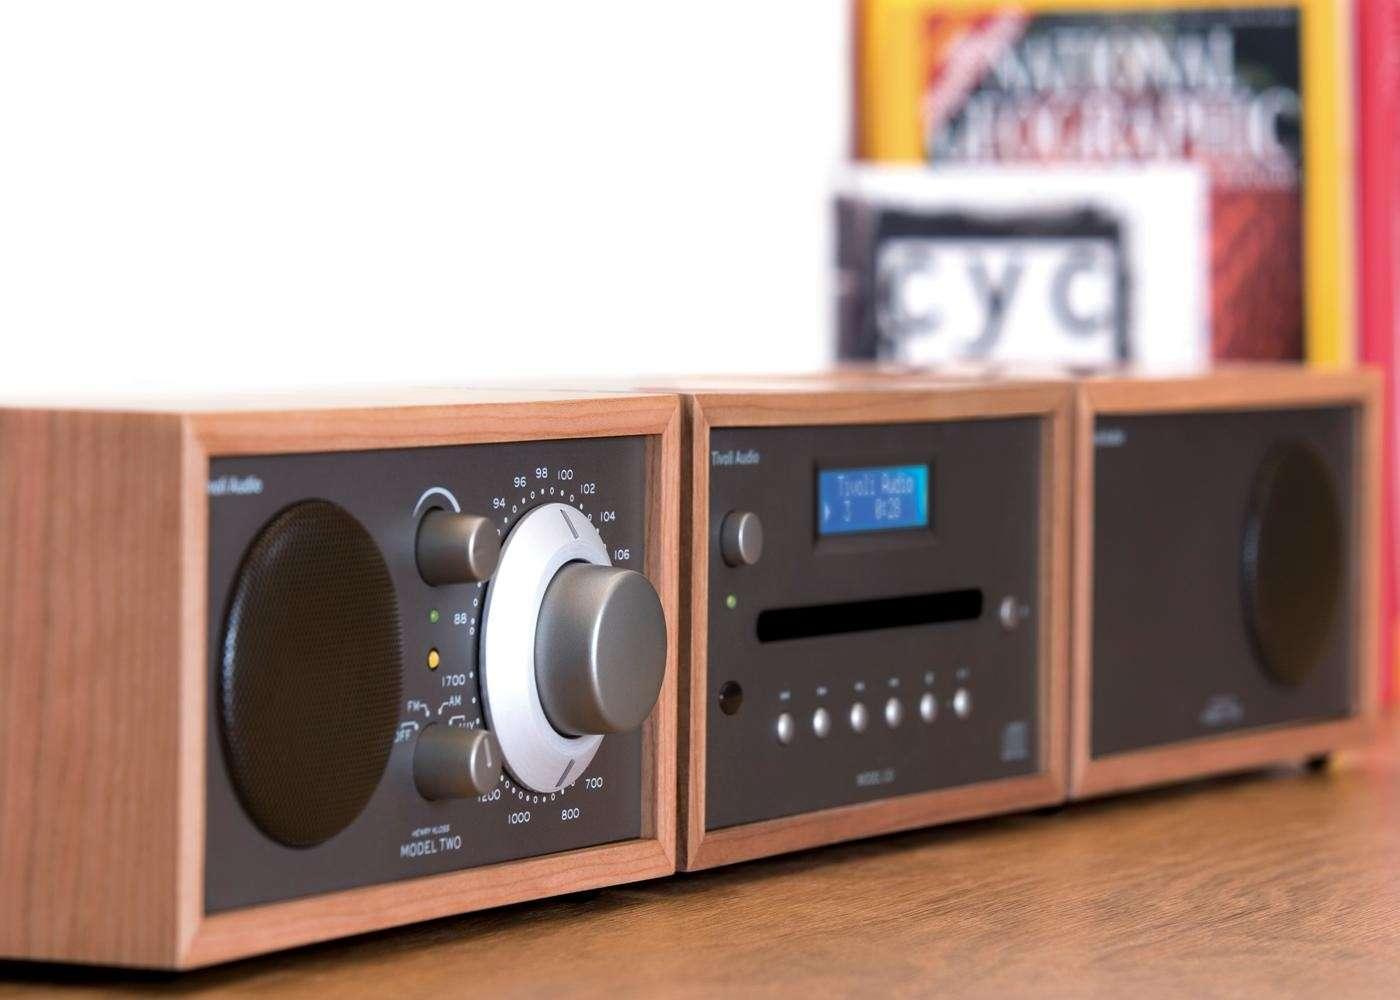 6-1860-tivoli-radio-combo-system-cool_4